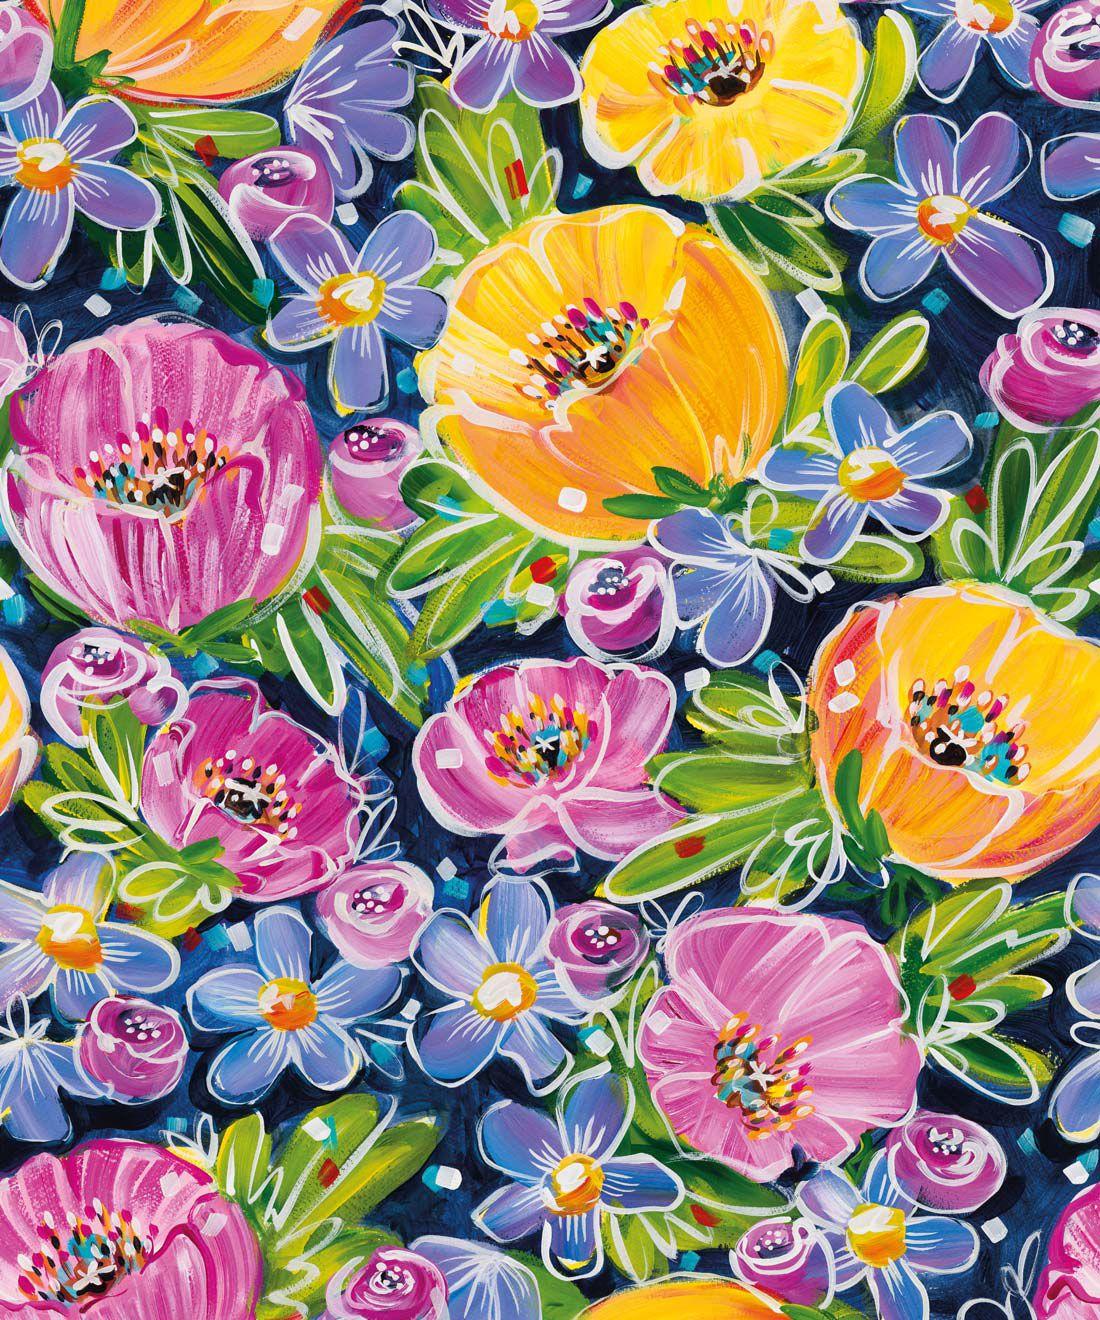 Peony Poppies Wallpaper